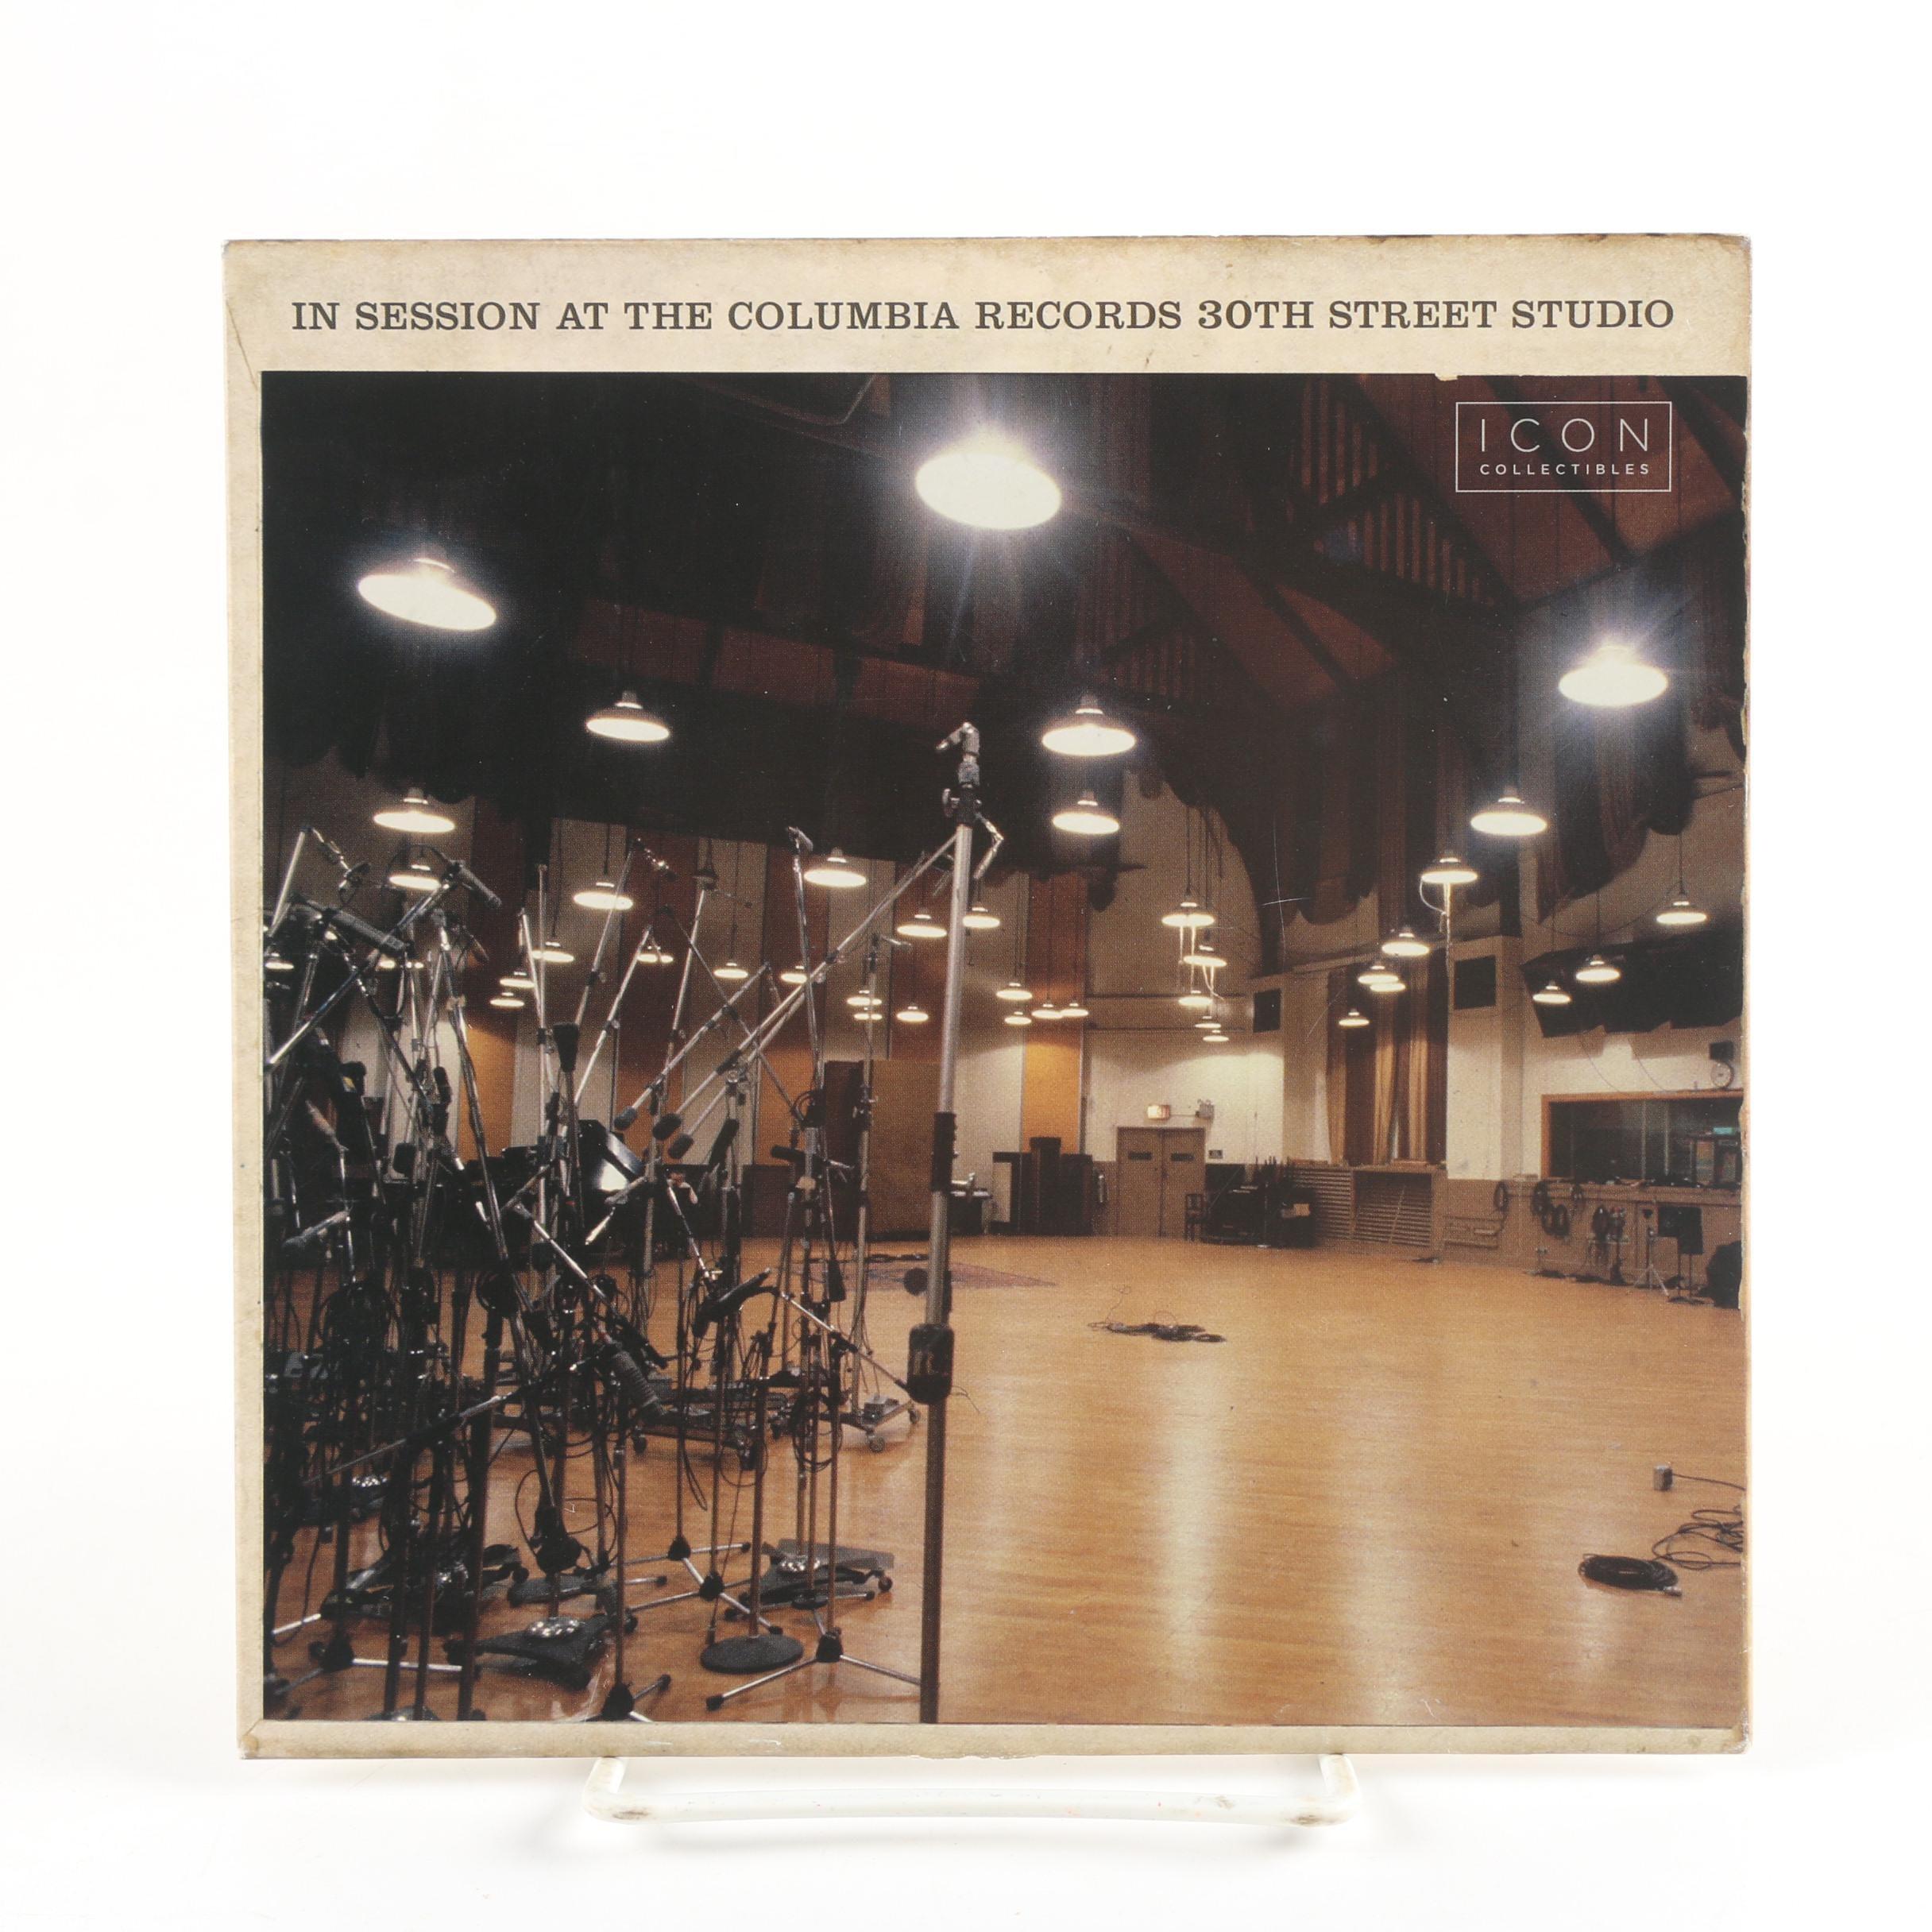 VIP Morrison Hotel 45 RPM Vinyl Record Featuring Bob Dylan and Tony Bennett